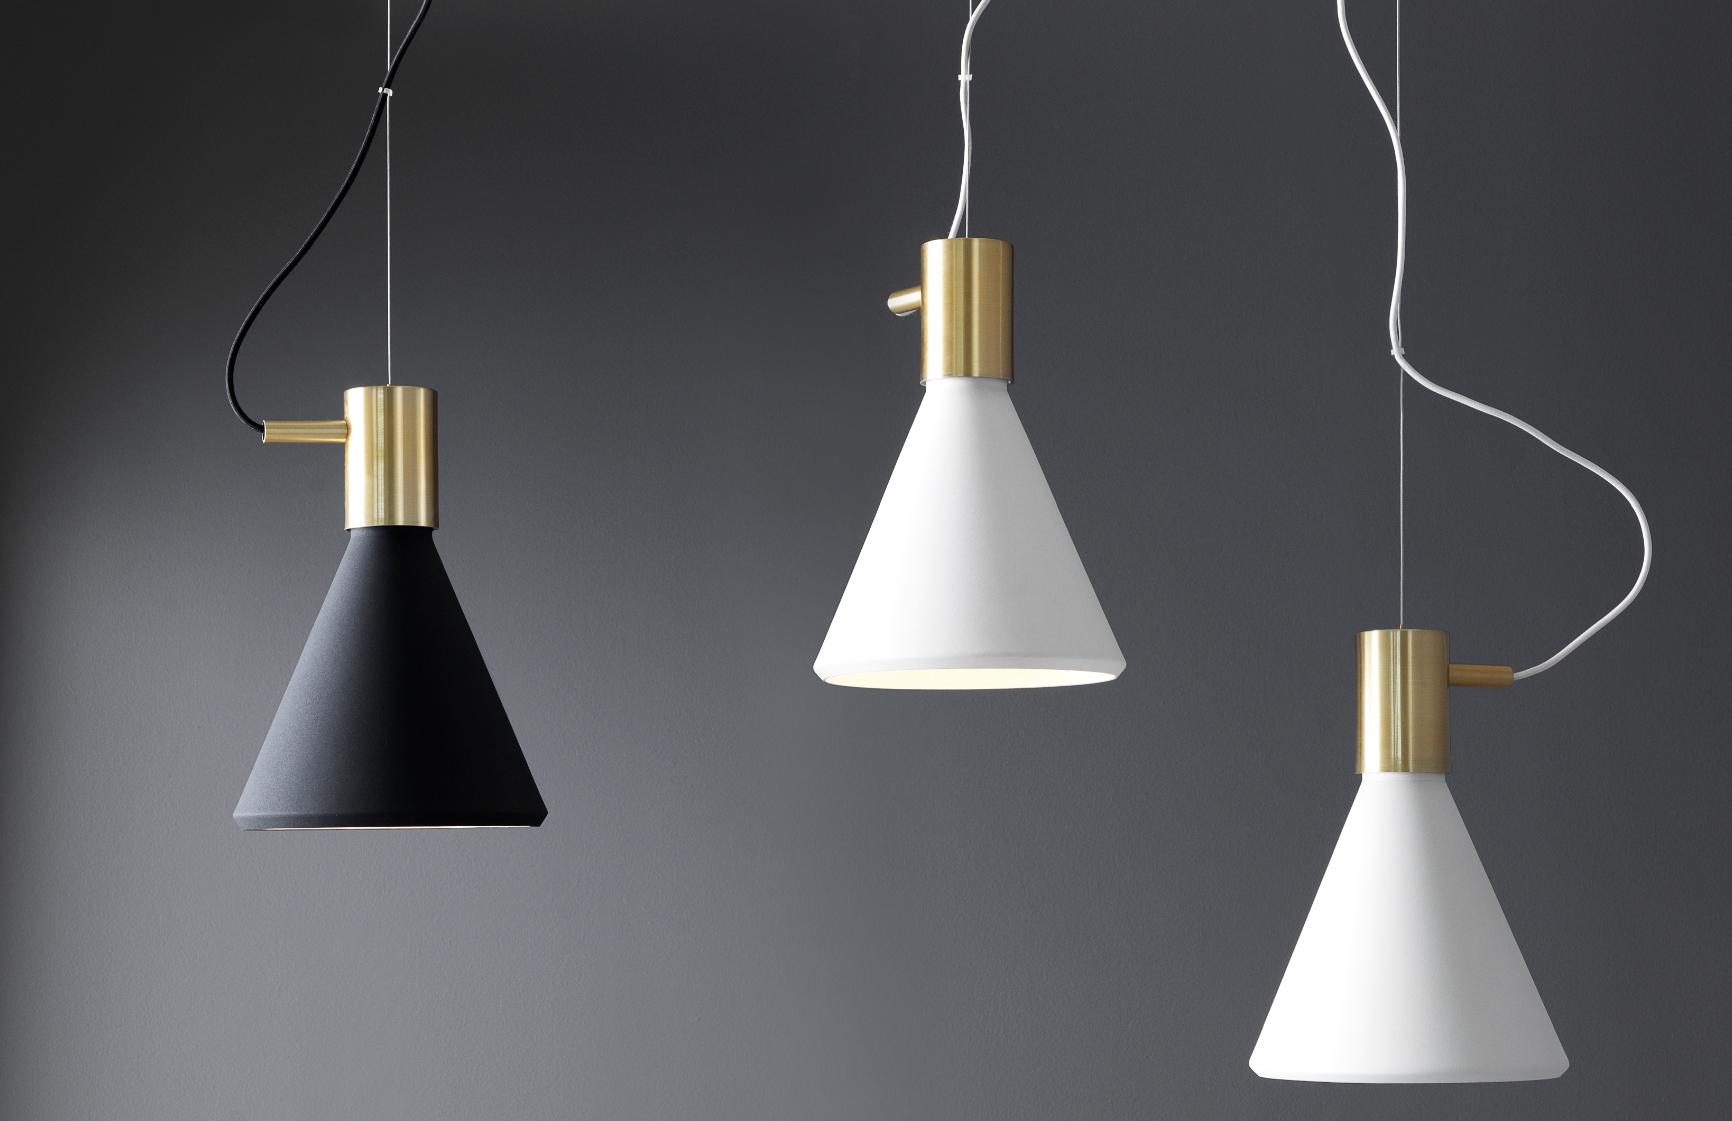 scandinavian lighting design. A G T O N Designjob For Pholc · Scandinavian LightingLighting DesignRumLight Design Lighting S